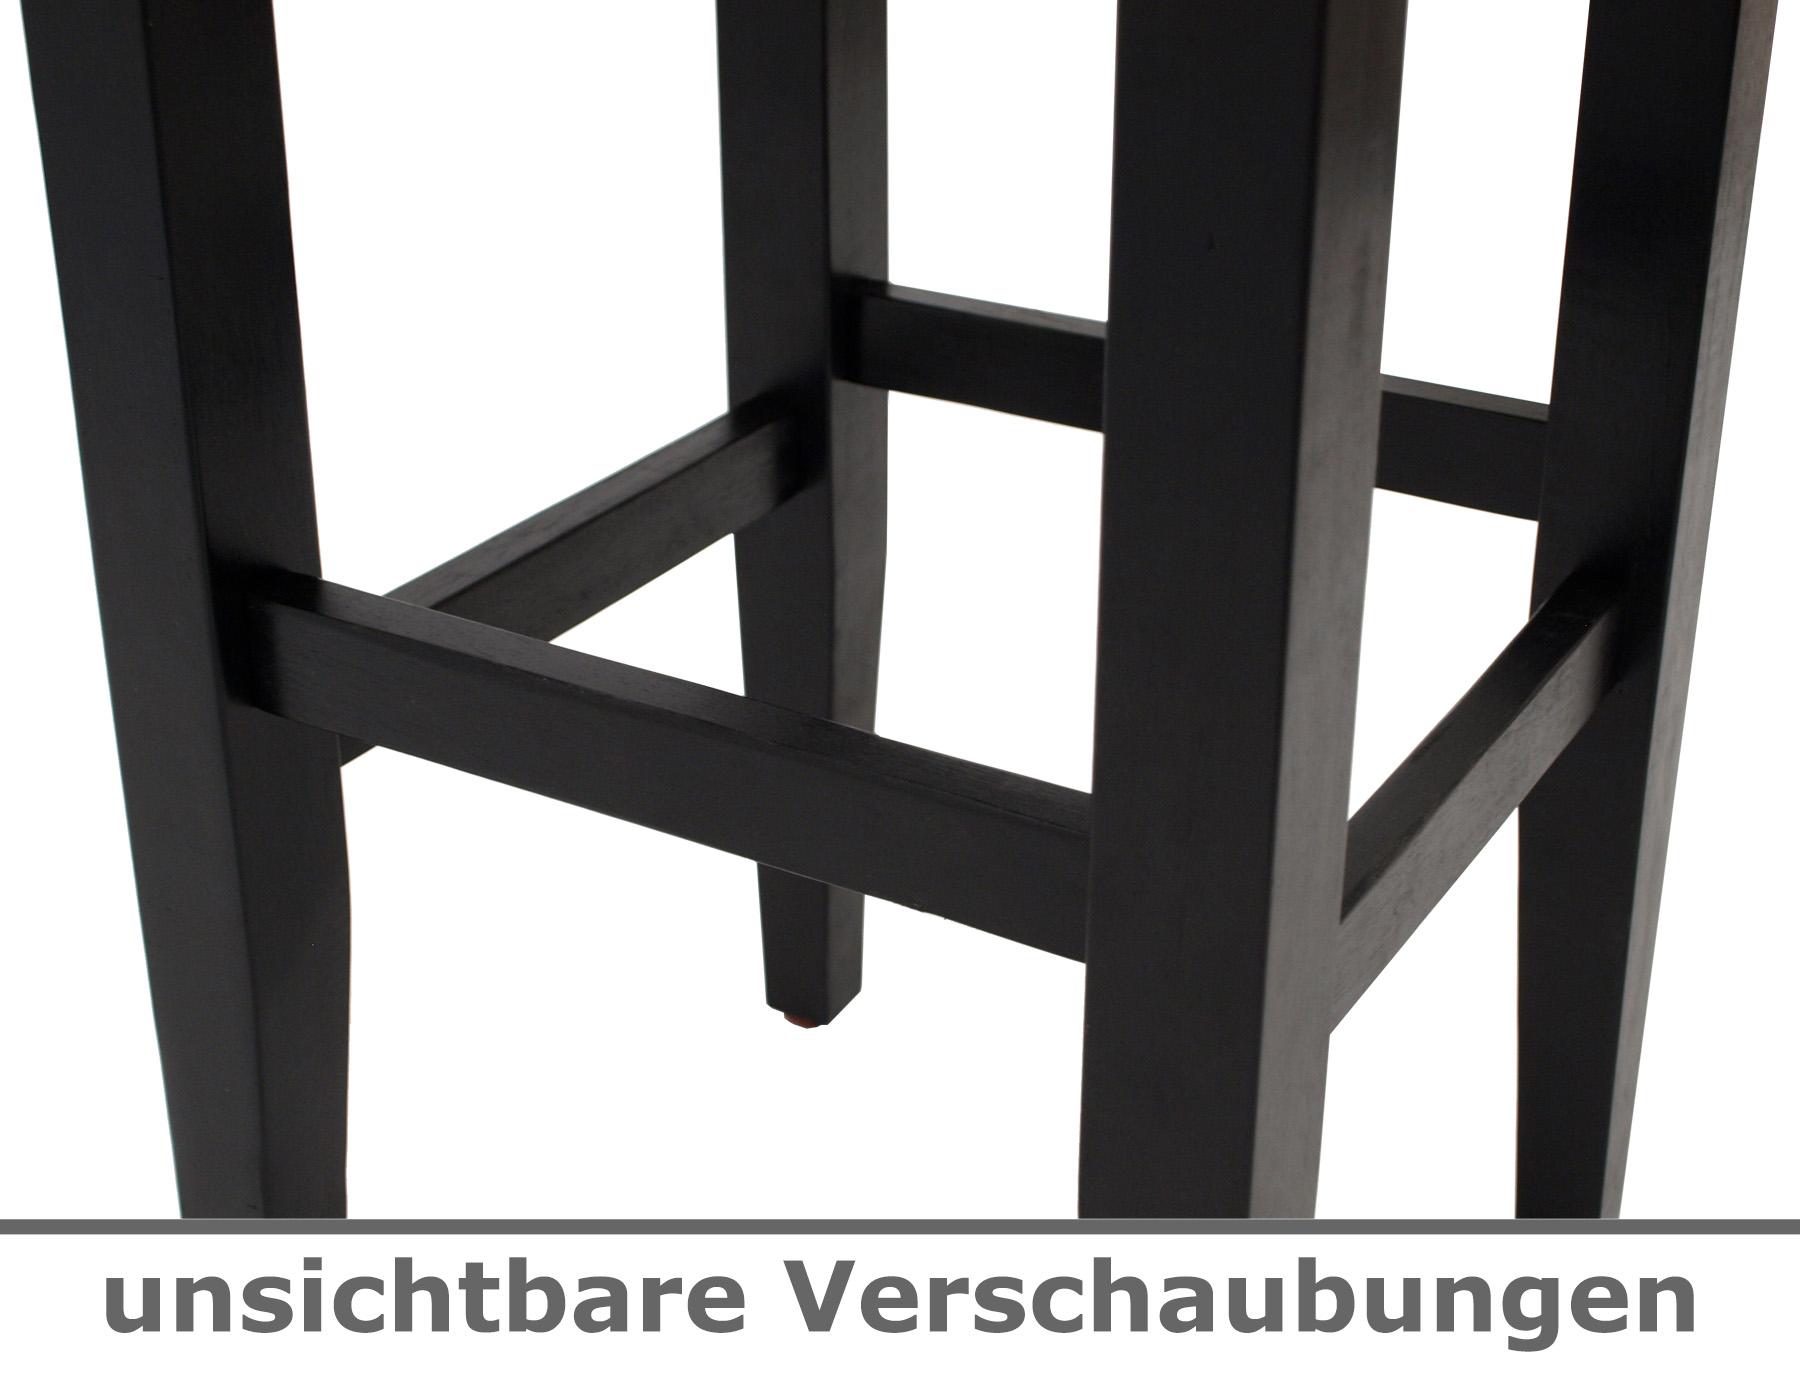 Barhocker Barstuhl Barmobel Thekenstuhl Bodega Holz Und Bezug Schwarz 2 Stuck Ebay